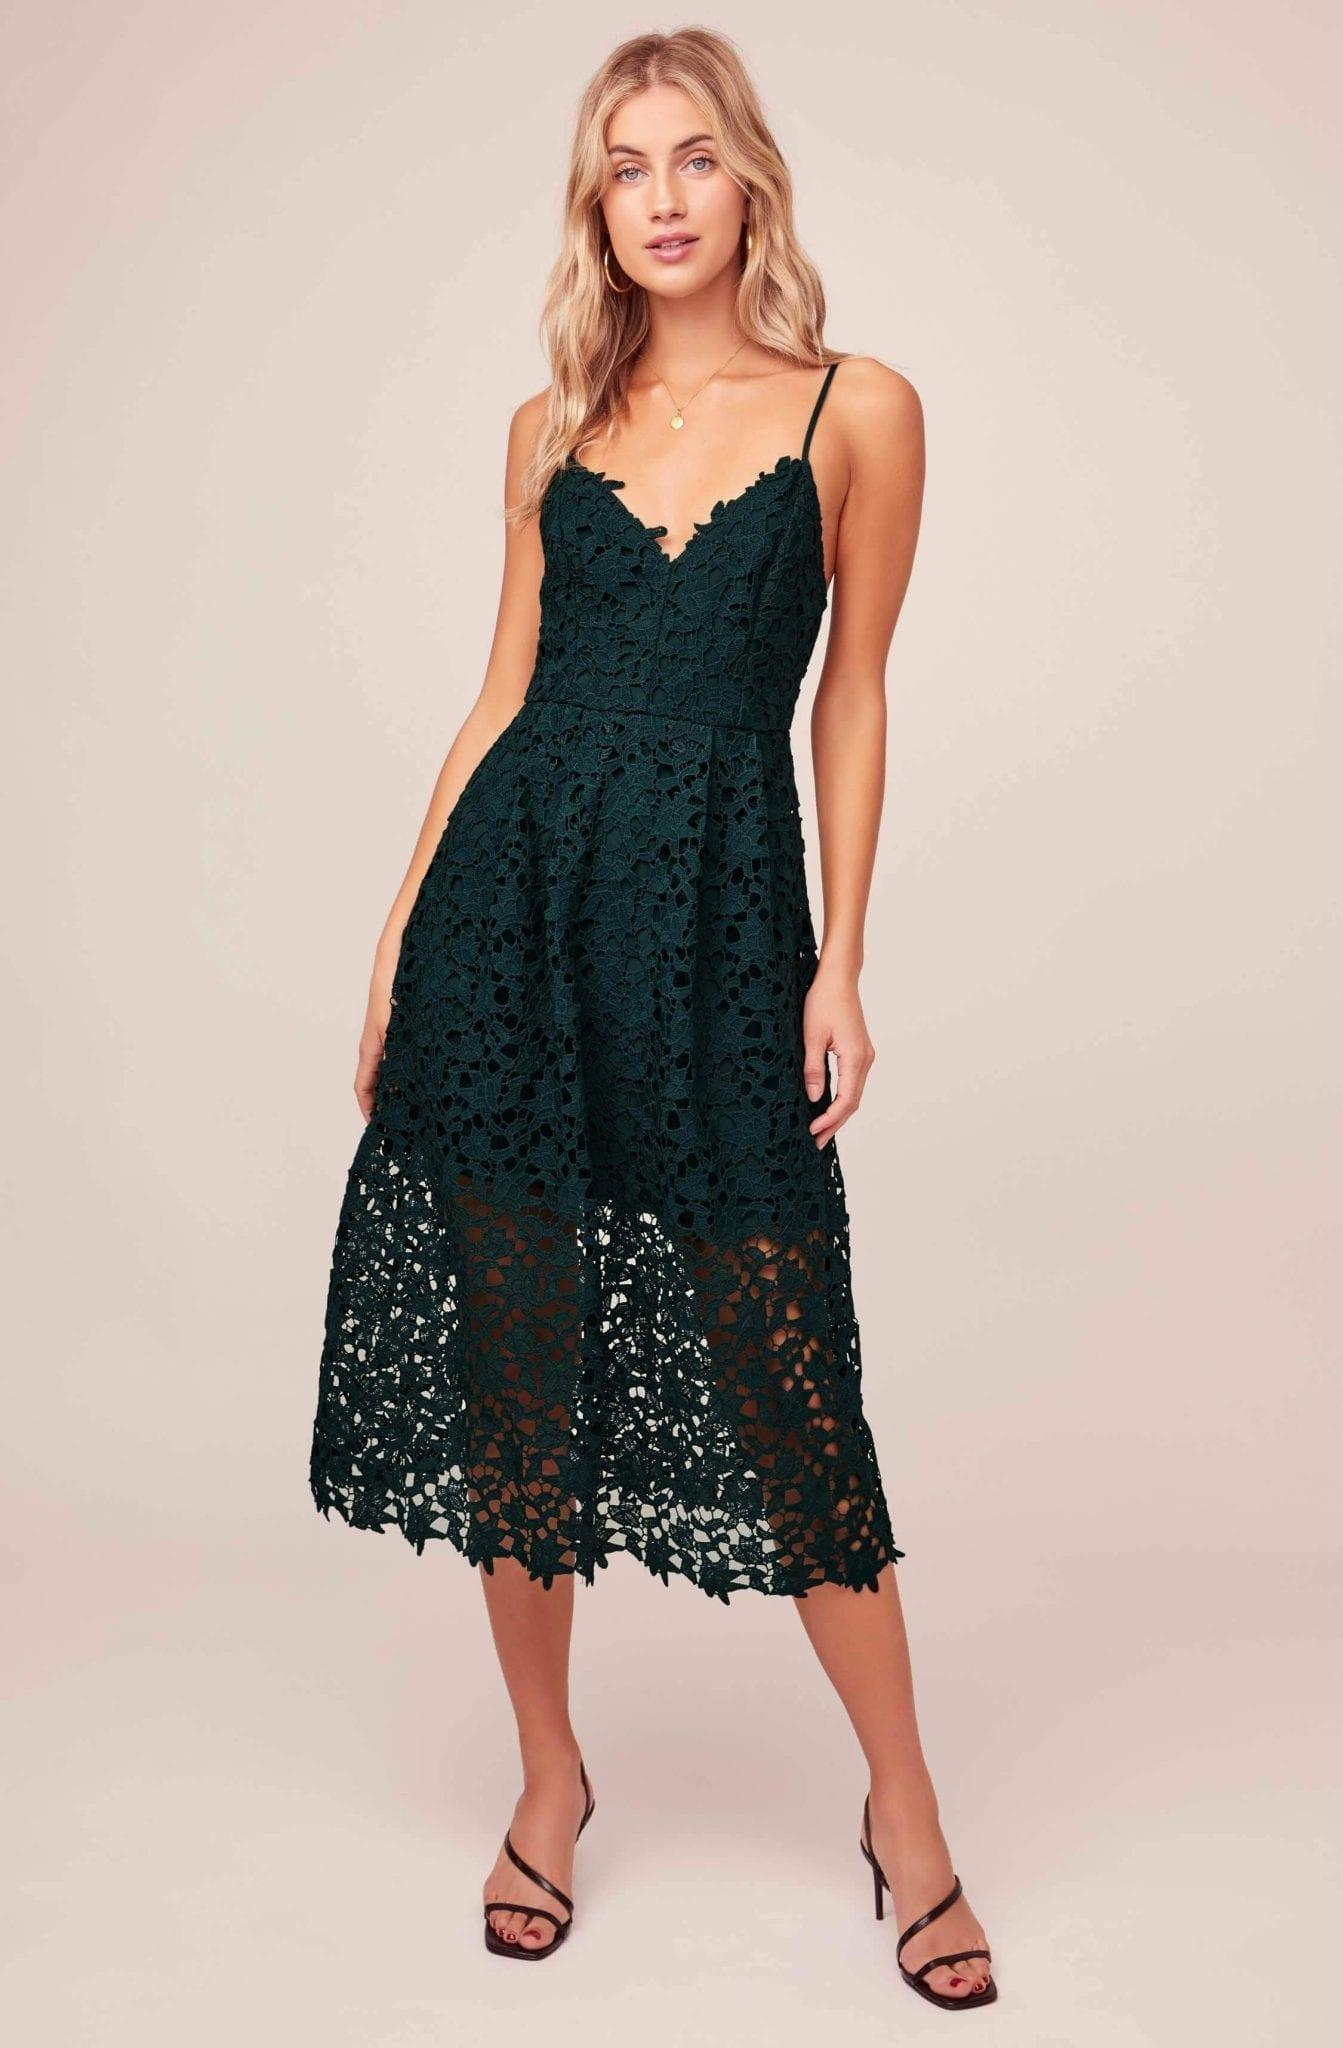 ASTRTHELABEL Lace A Line Midi Dress